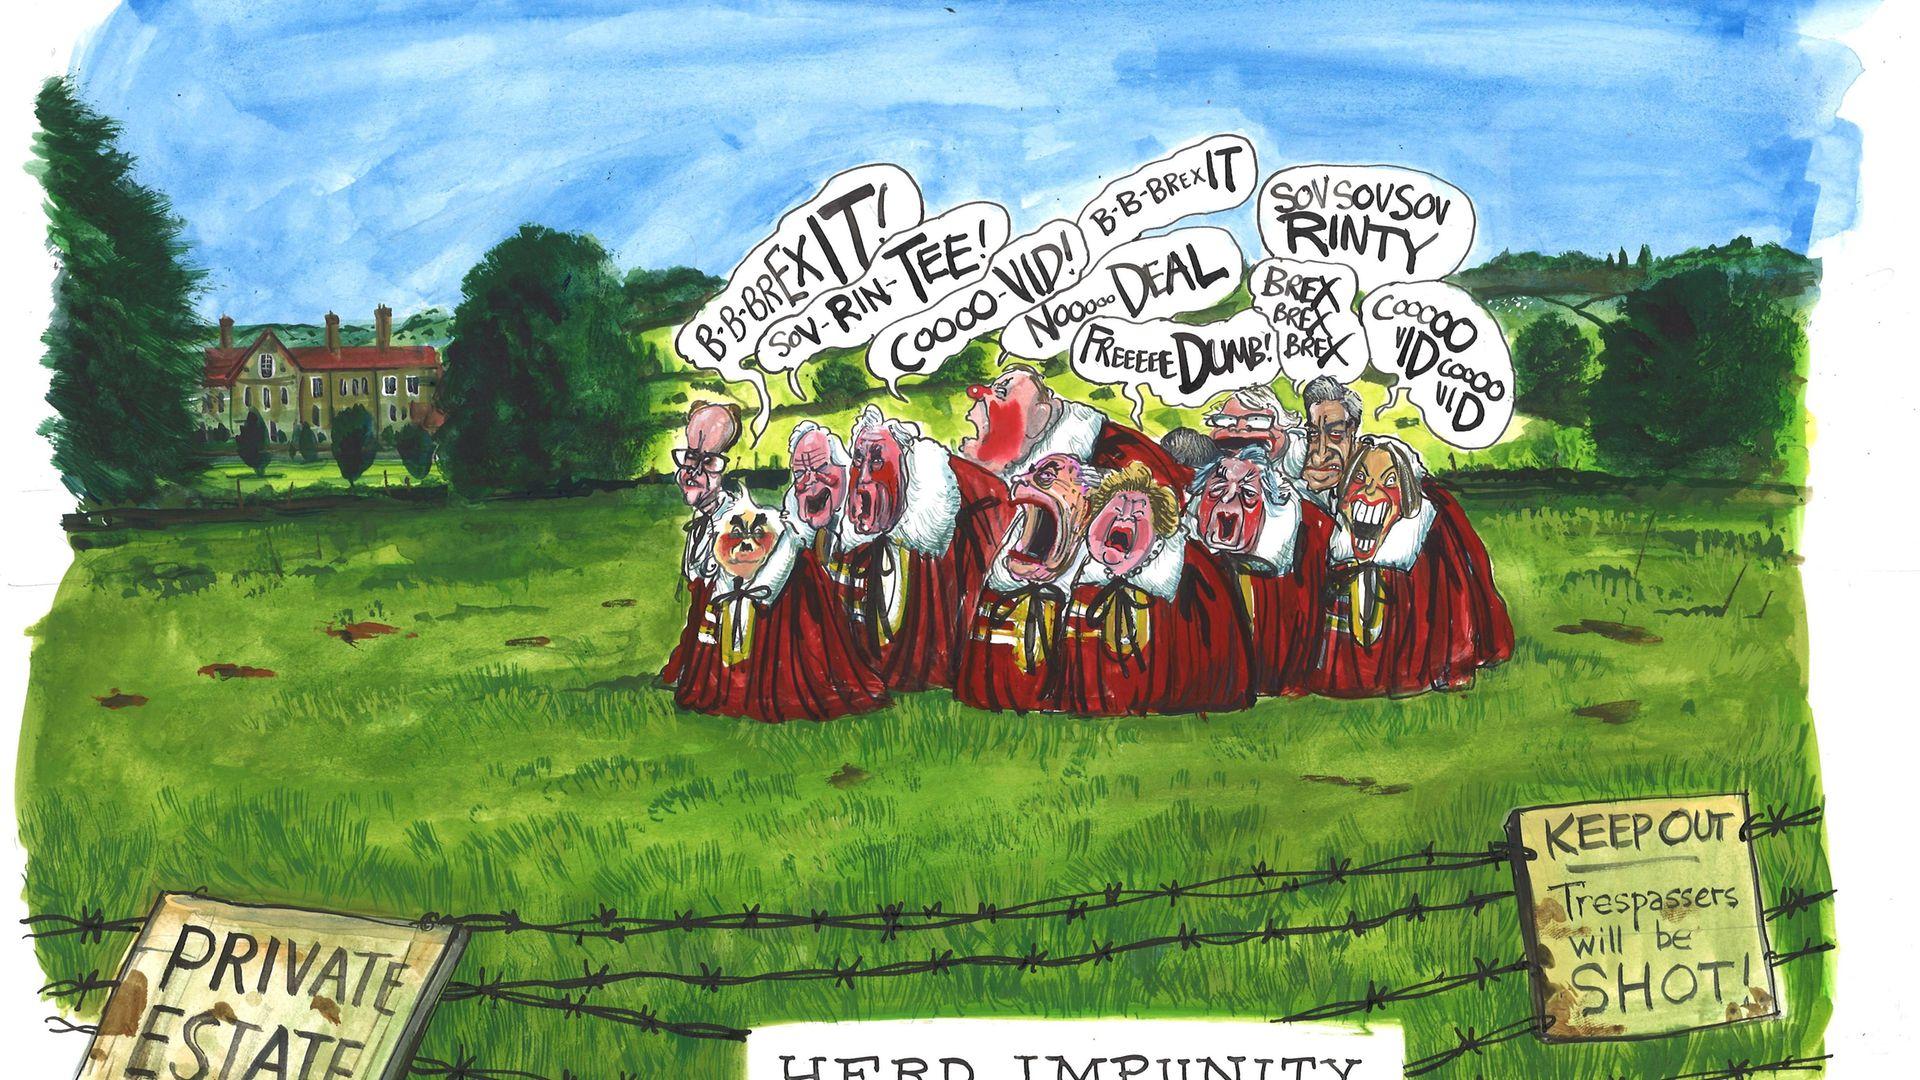 'Herd Impunity' by Martin Rowson - Credit: Martin Rowson